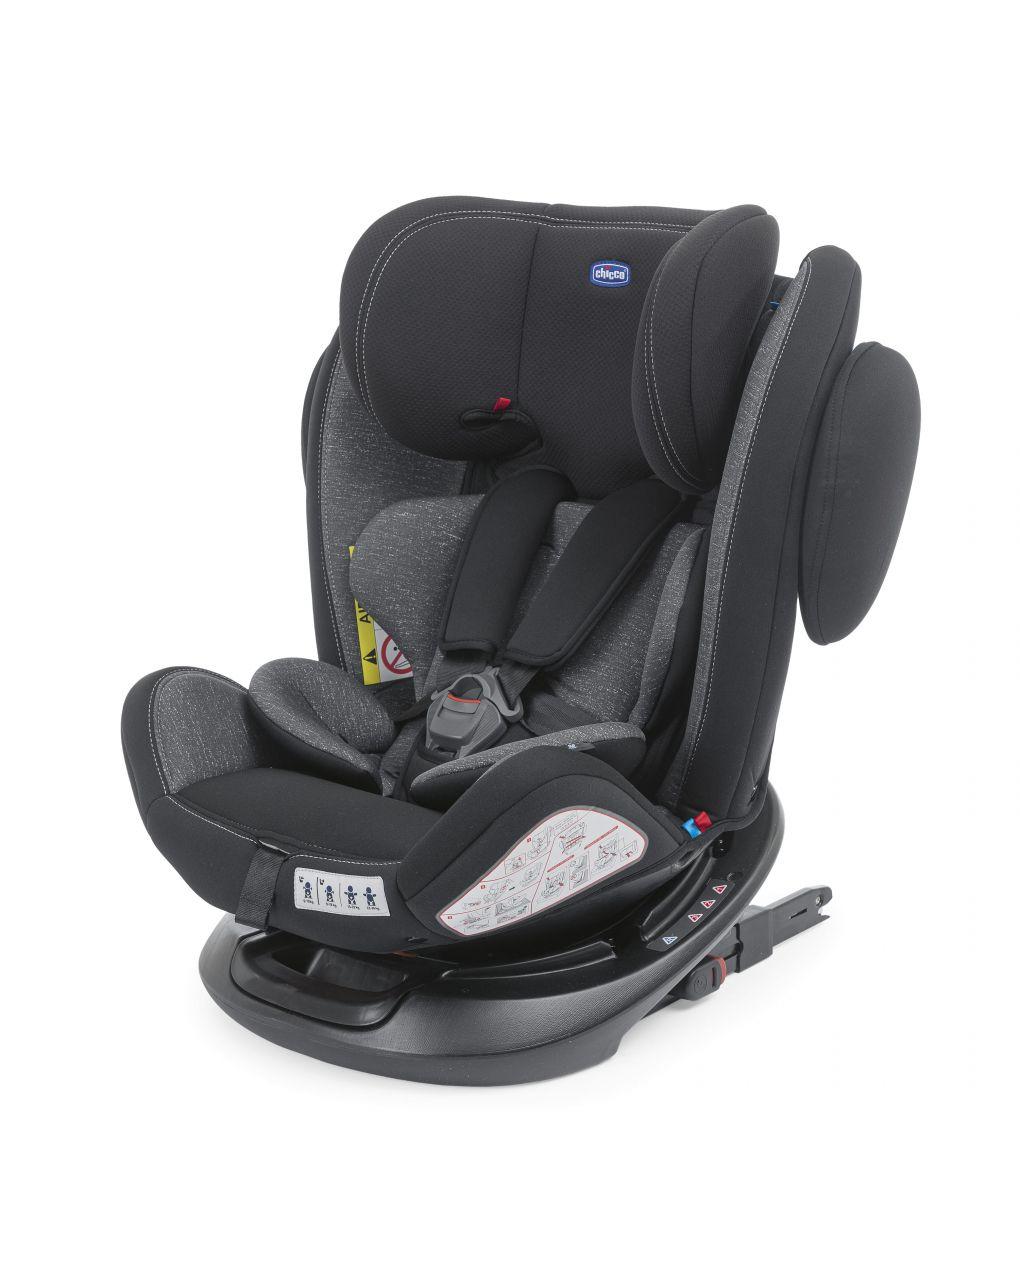 Chicco Κάθισμα Αυτοκινήτου Unico Plus (Group 0_1 _2_3) Ombra